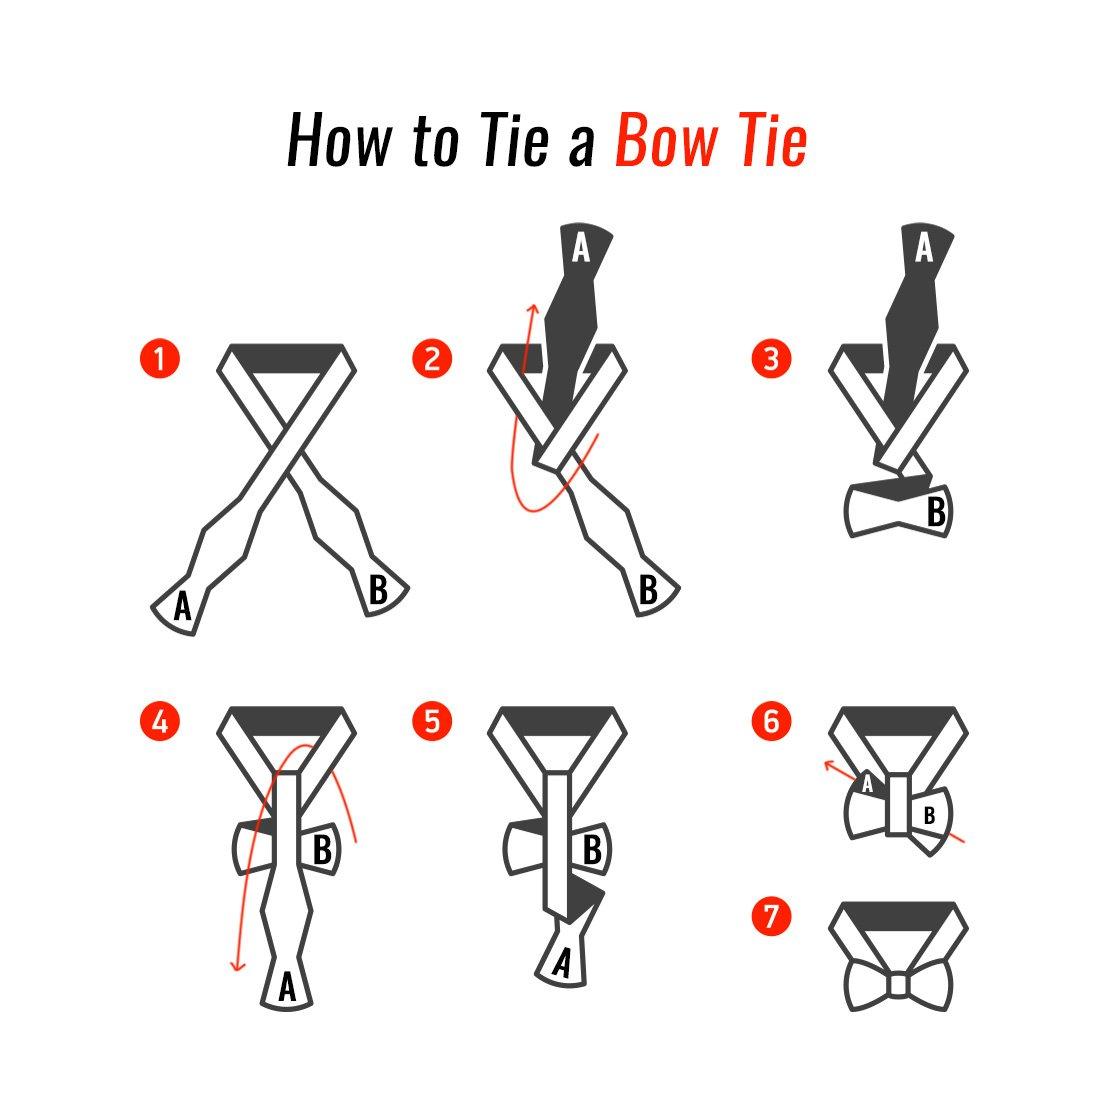 Set 4 BMC Mens Mens Mens 3pc Reversible Mixed Design Self Tied Adjustable Flat Tip Style Bow Ties - Set 4 df27f5